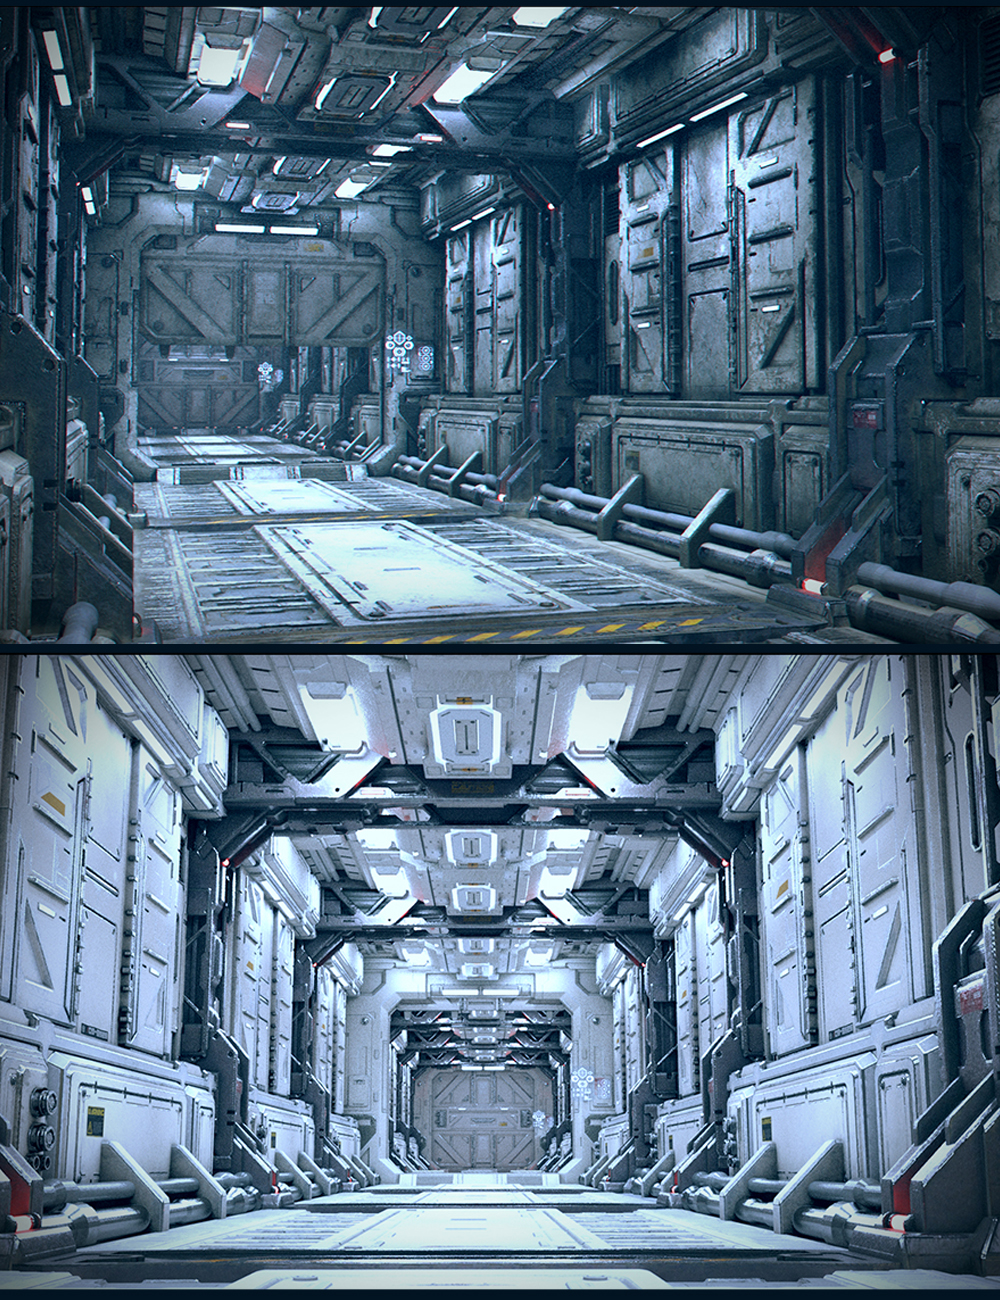 Sci-Fi Reactor Corridor by: Polish, 3D Models by Daz 3D